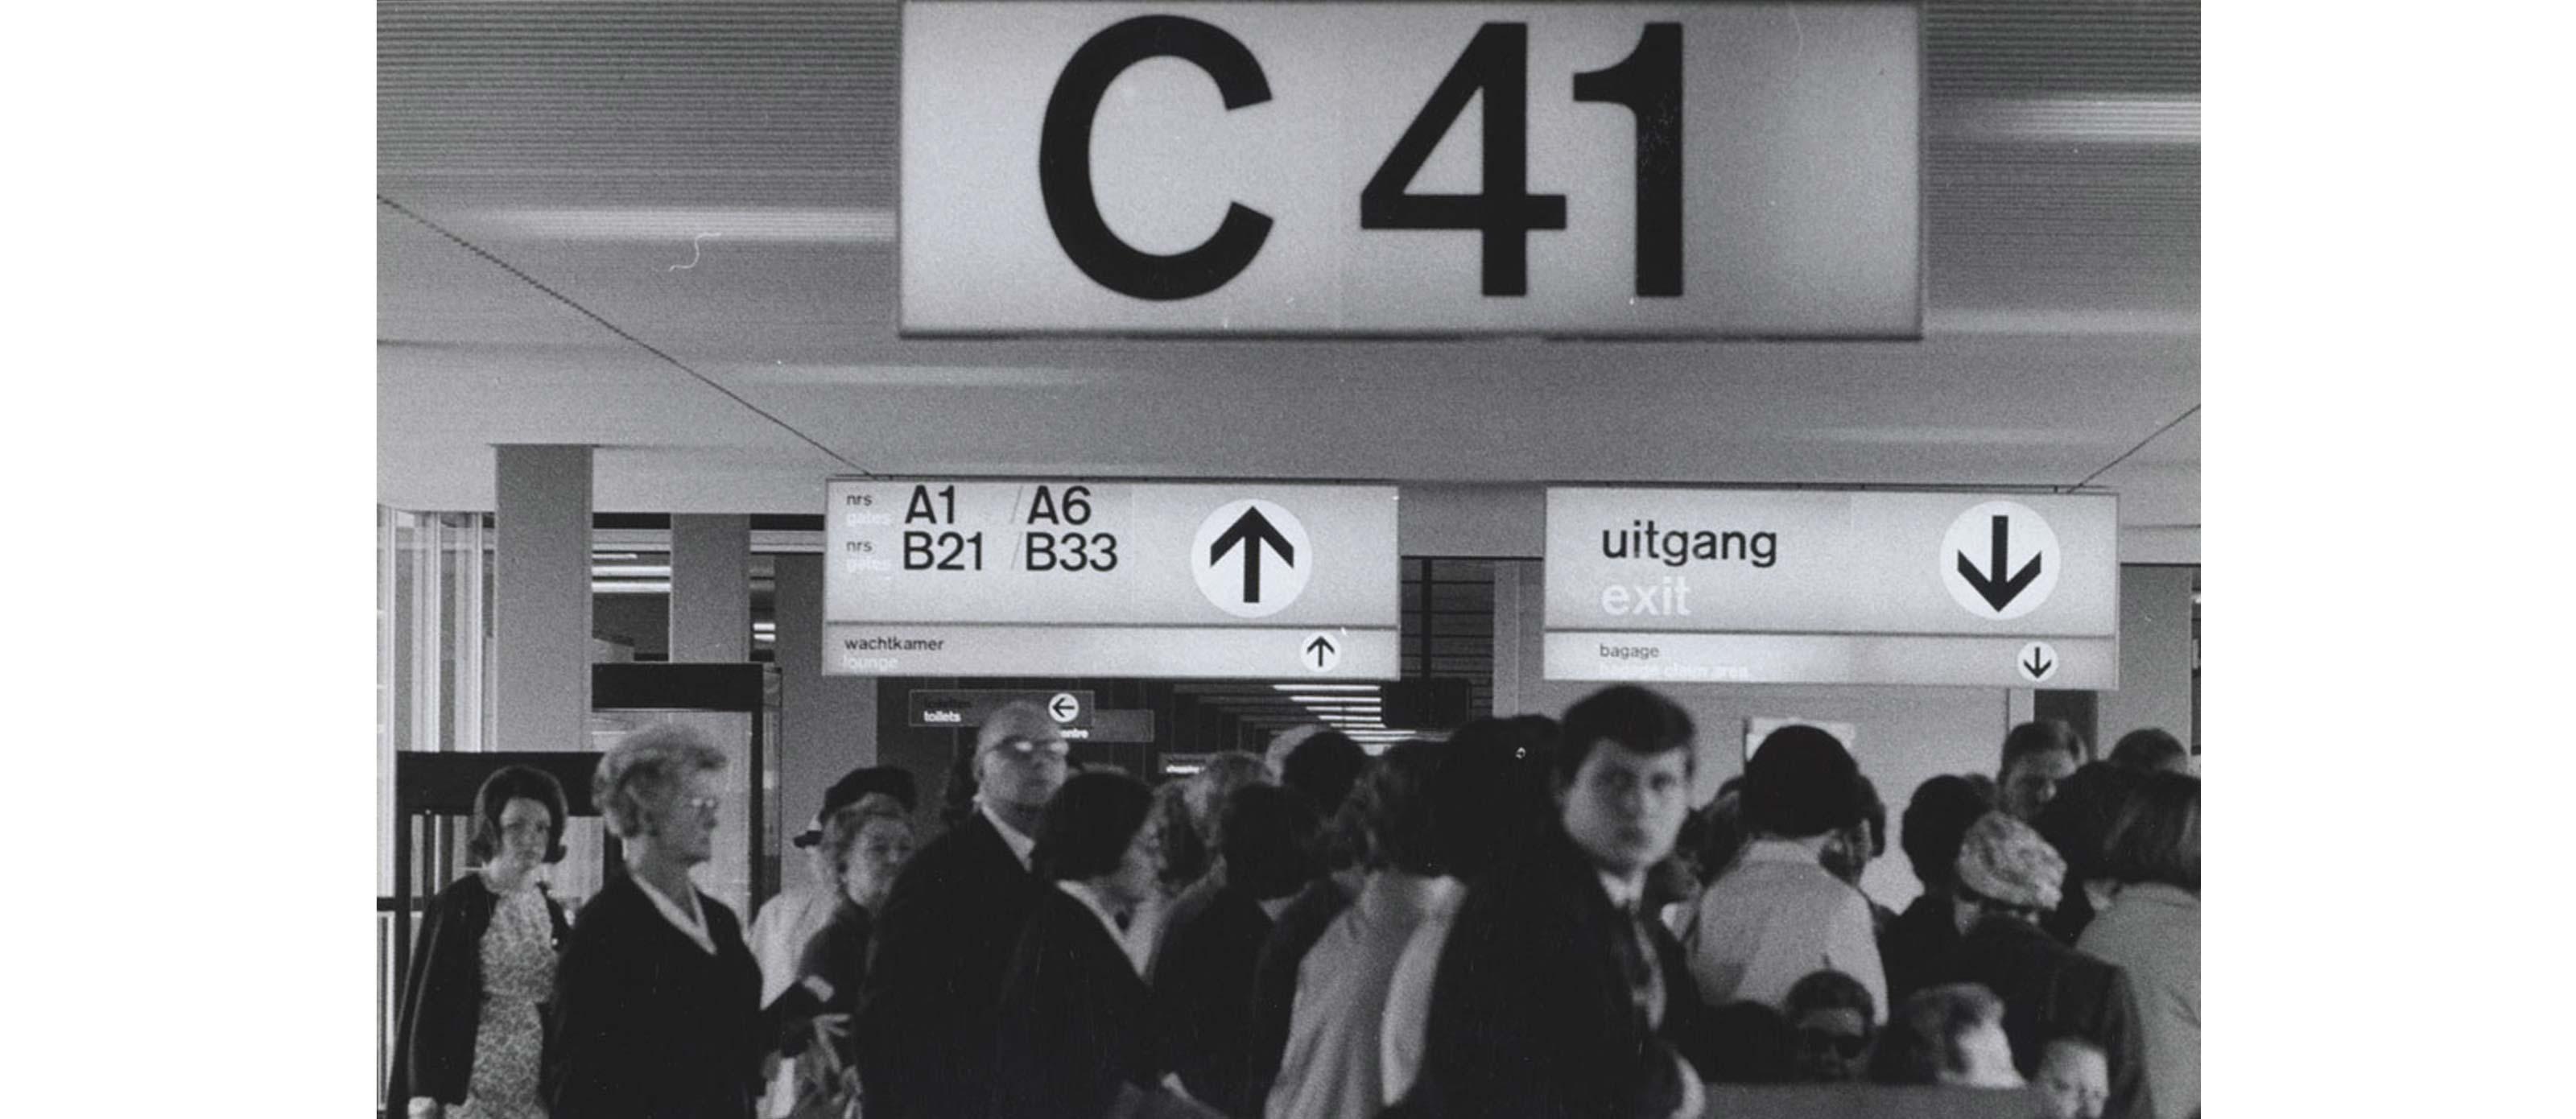 benno-wissing-signaletique-aeroport-schiphol-1967-03